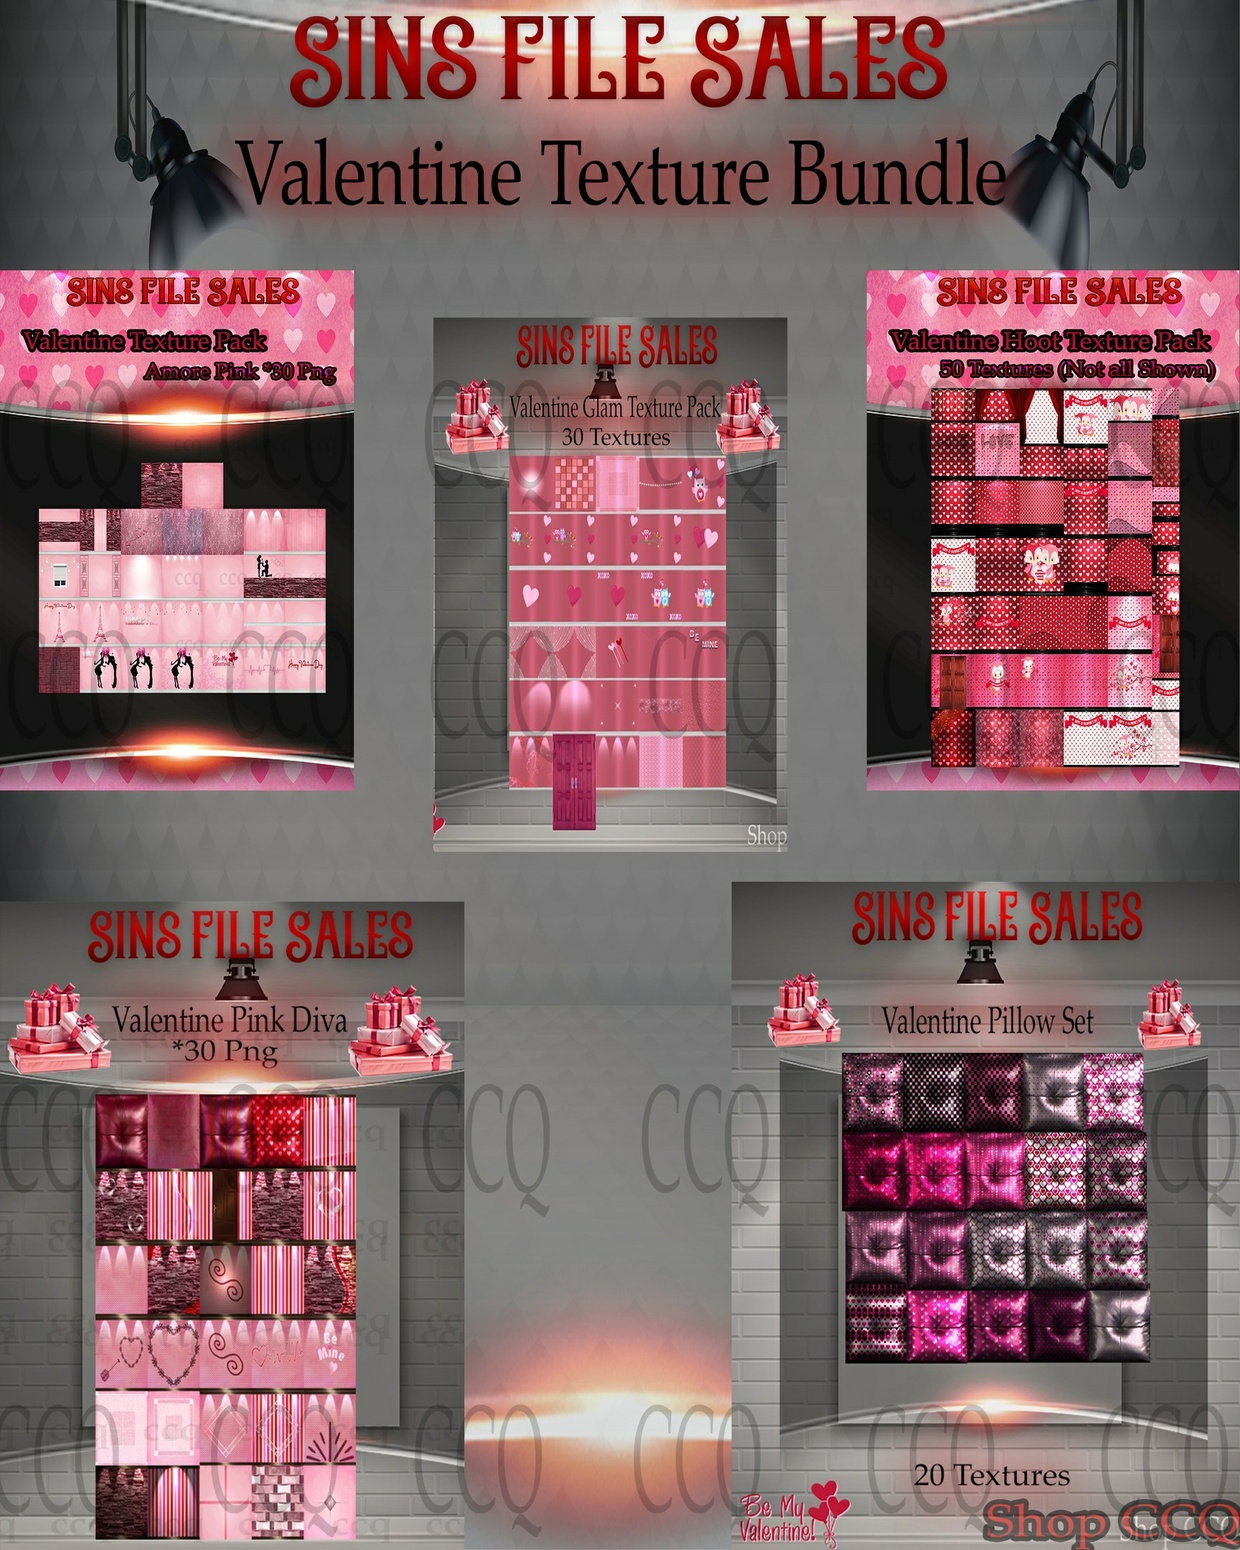 ♥Valentine Texture Bundle♥ 5 Packs Included